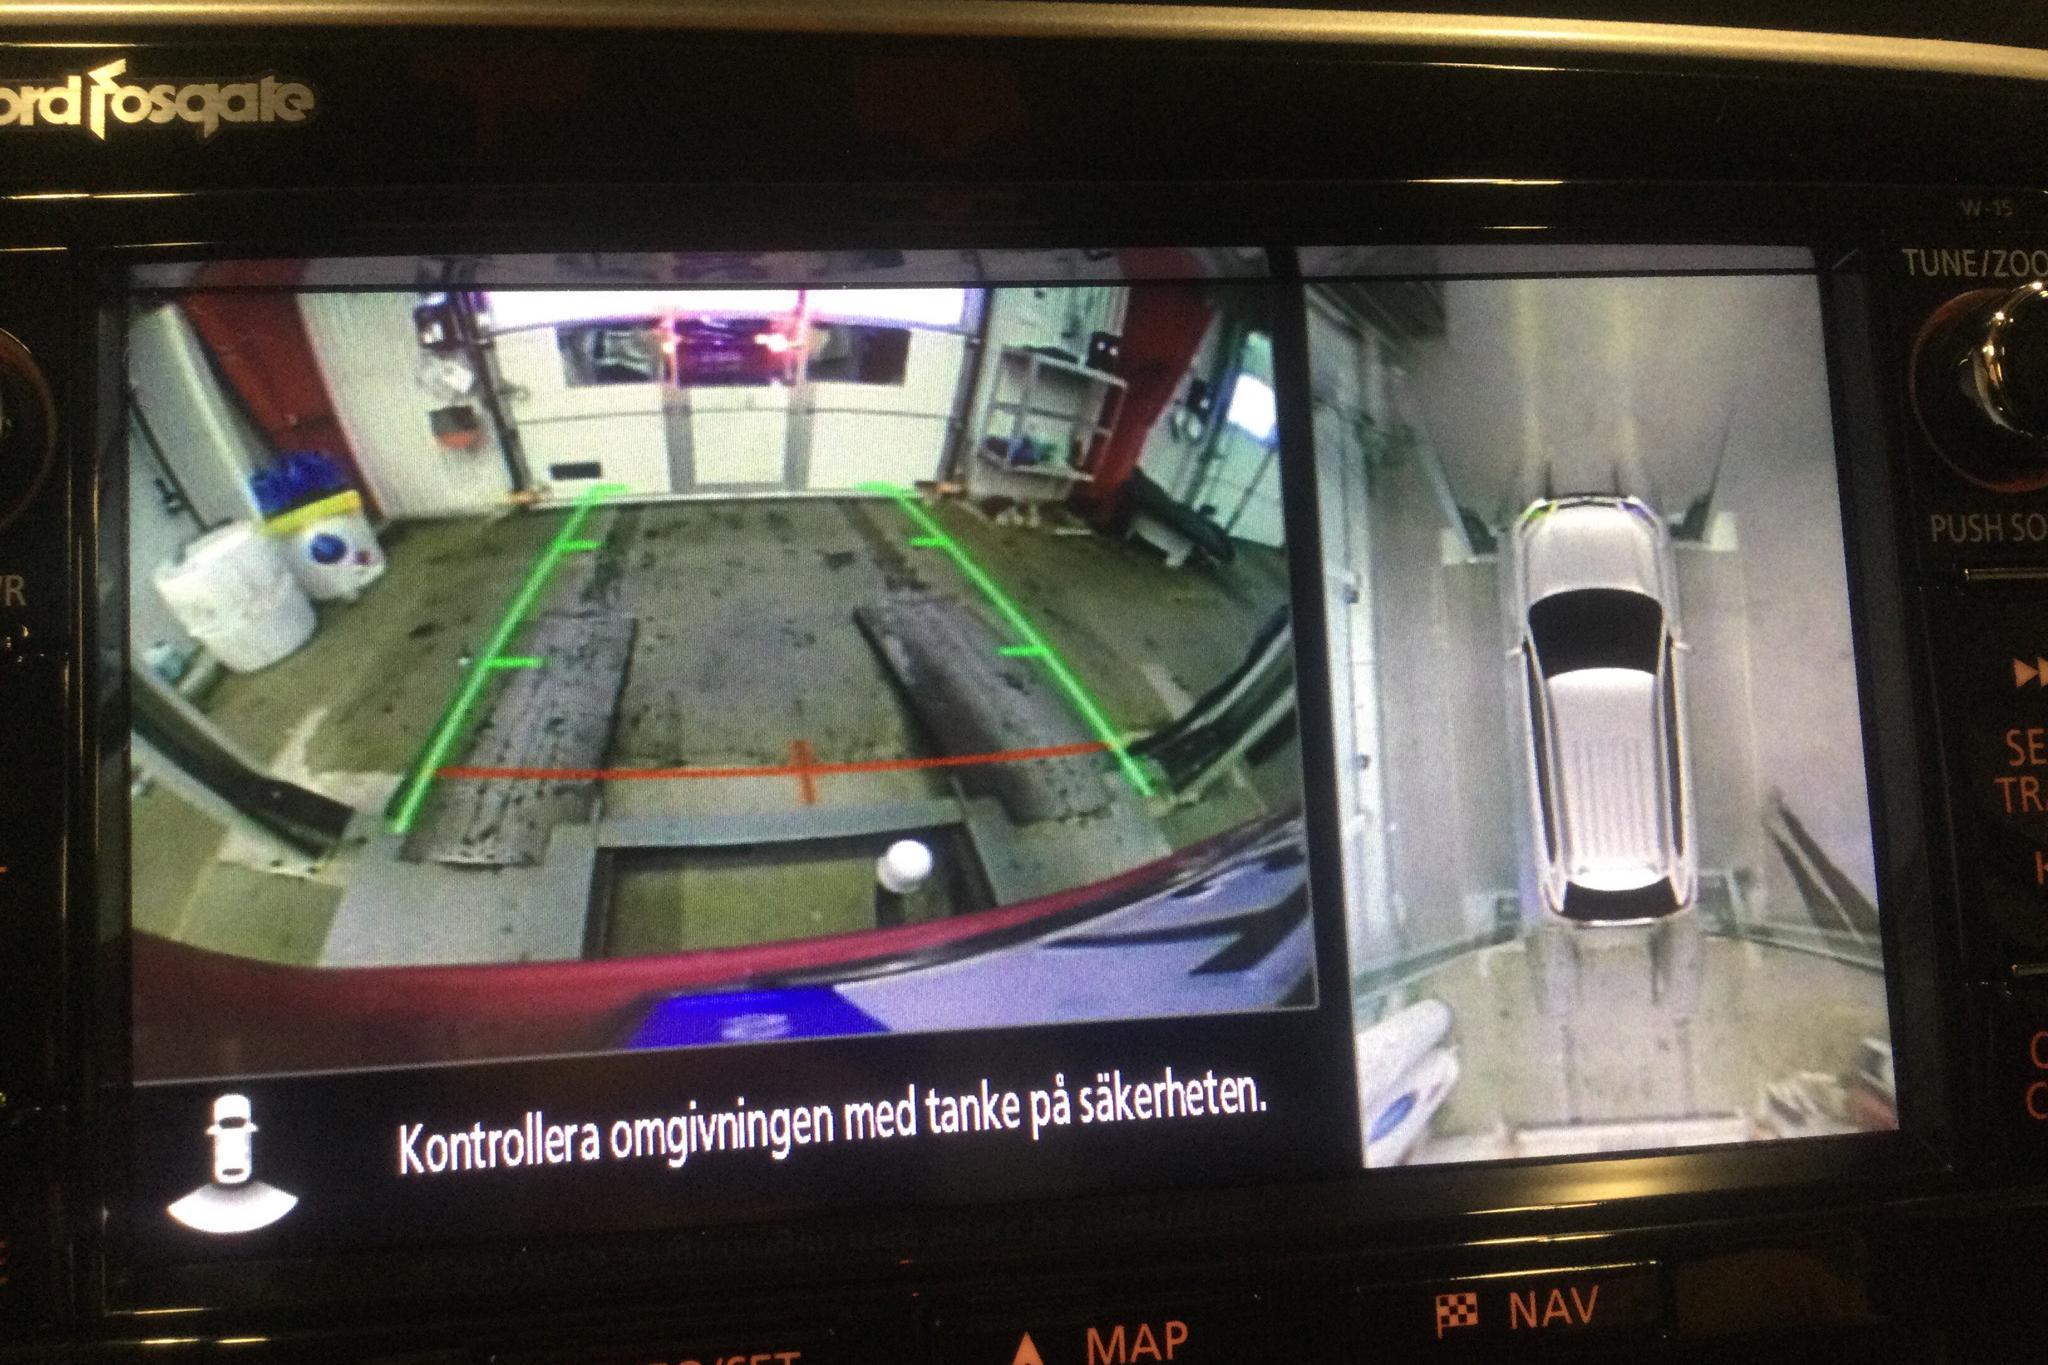 Mitsubishi Outlander 2.0 Plug-in Hybrid 4WD (121hk) - 89 900 km - Automatic - red - 2016